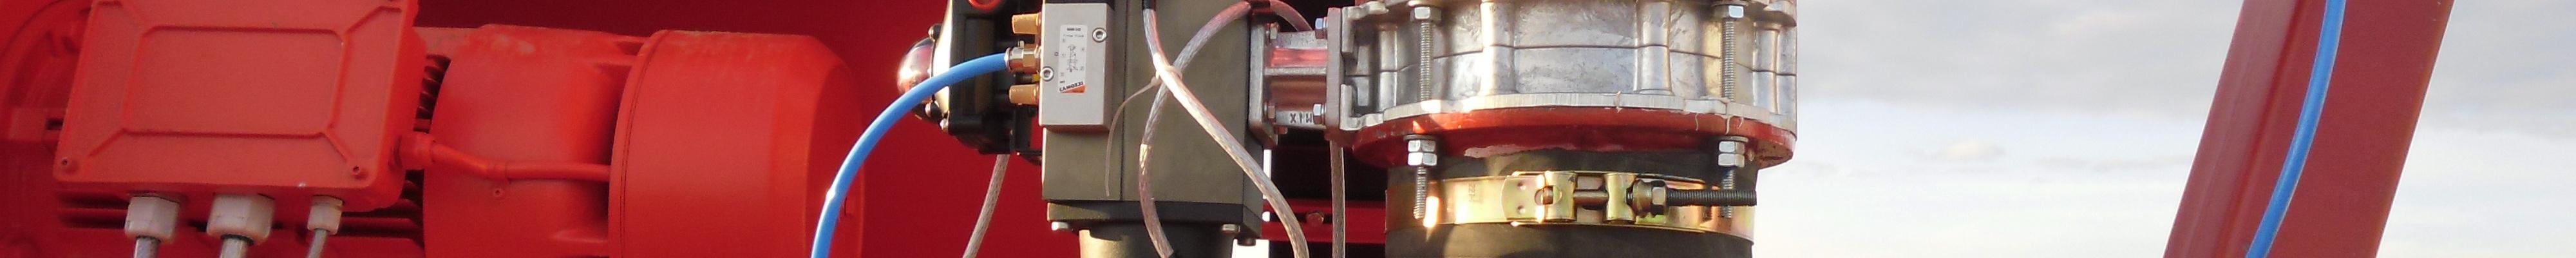 Инжиниринг весодозирующих технологий